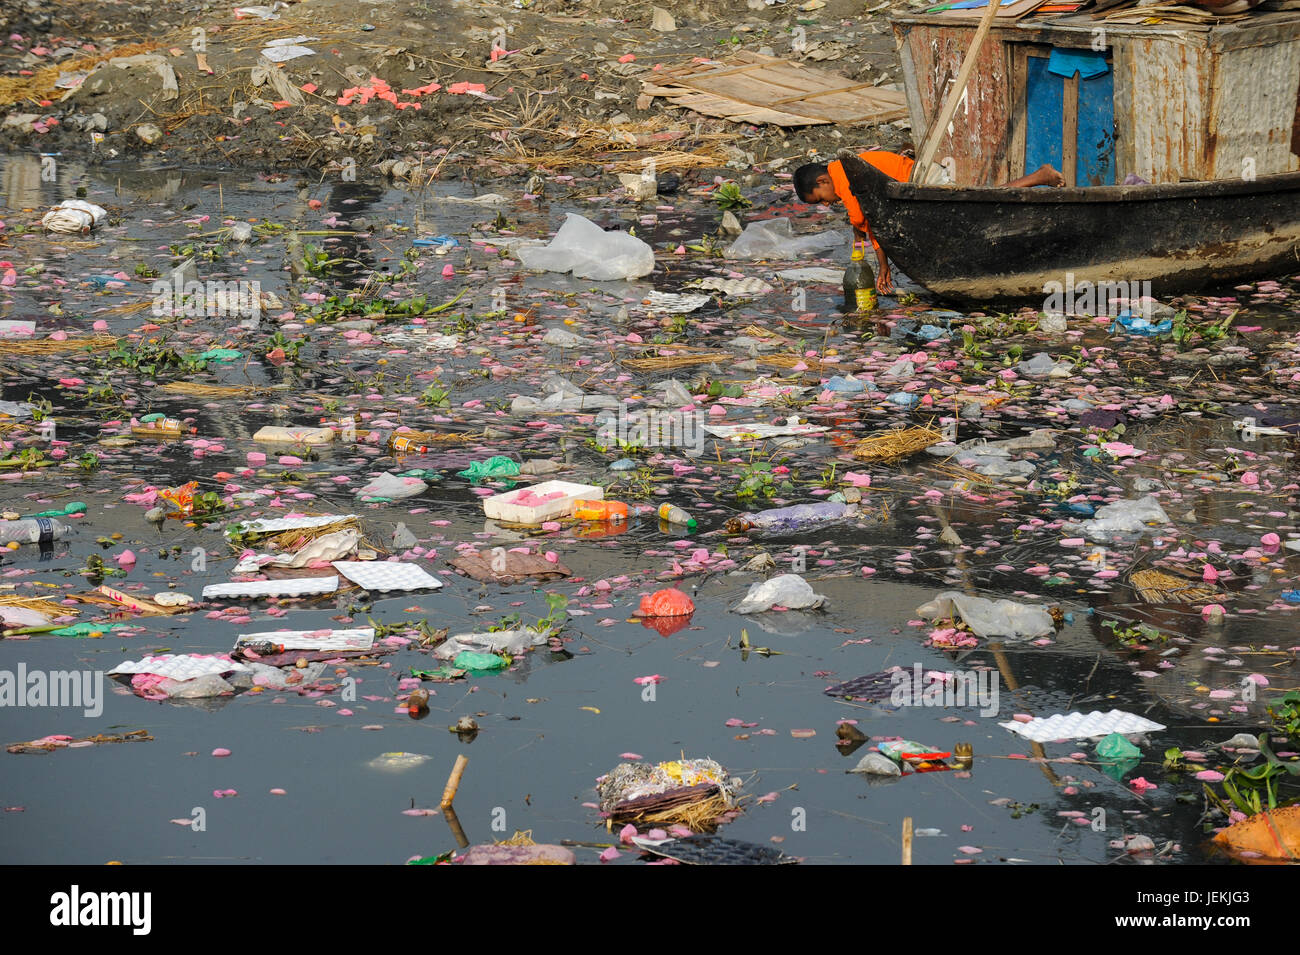 BANGLADESH Dhaka, plastic waste and polluted Buriganga river, boy fetch water / Bangladesch Dhaka , Junge schoepft - Stock Image